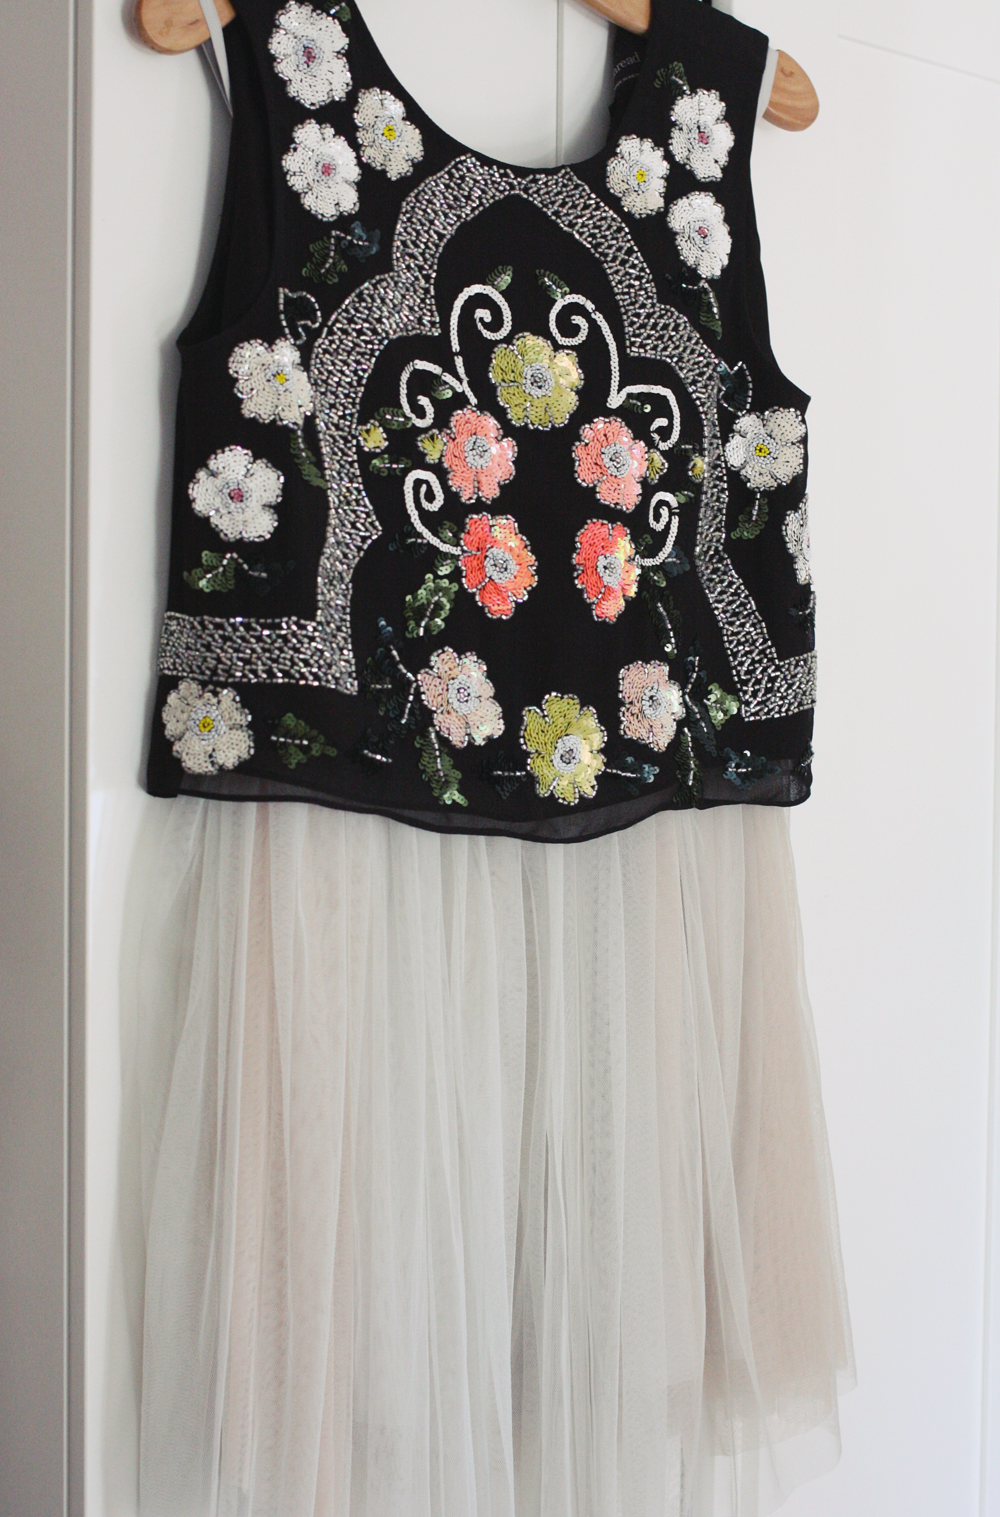 Skirt & Top: Both  Needle & Thread via ASOS